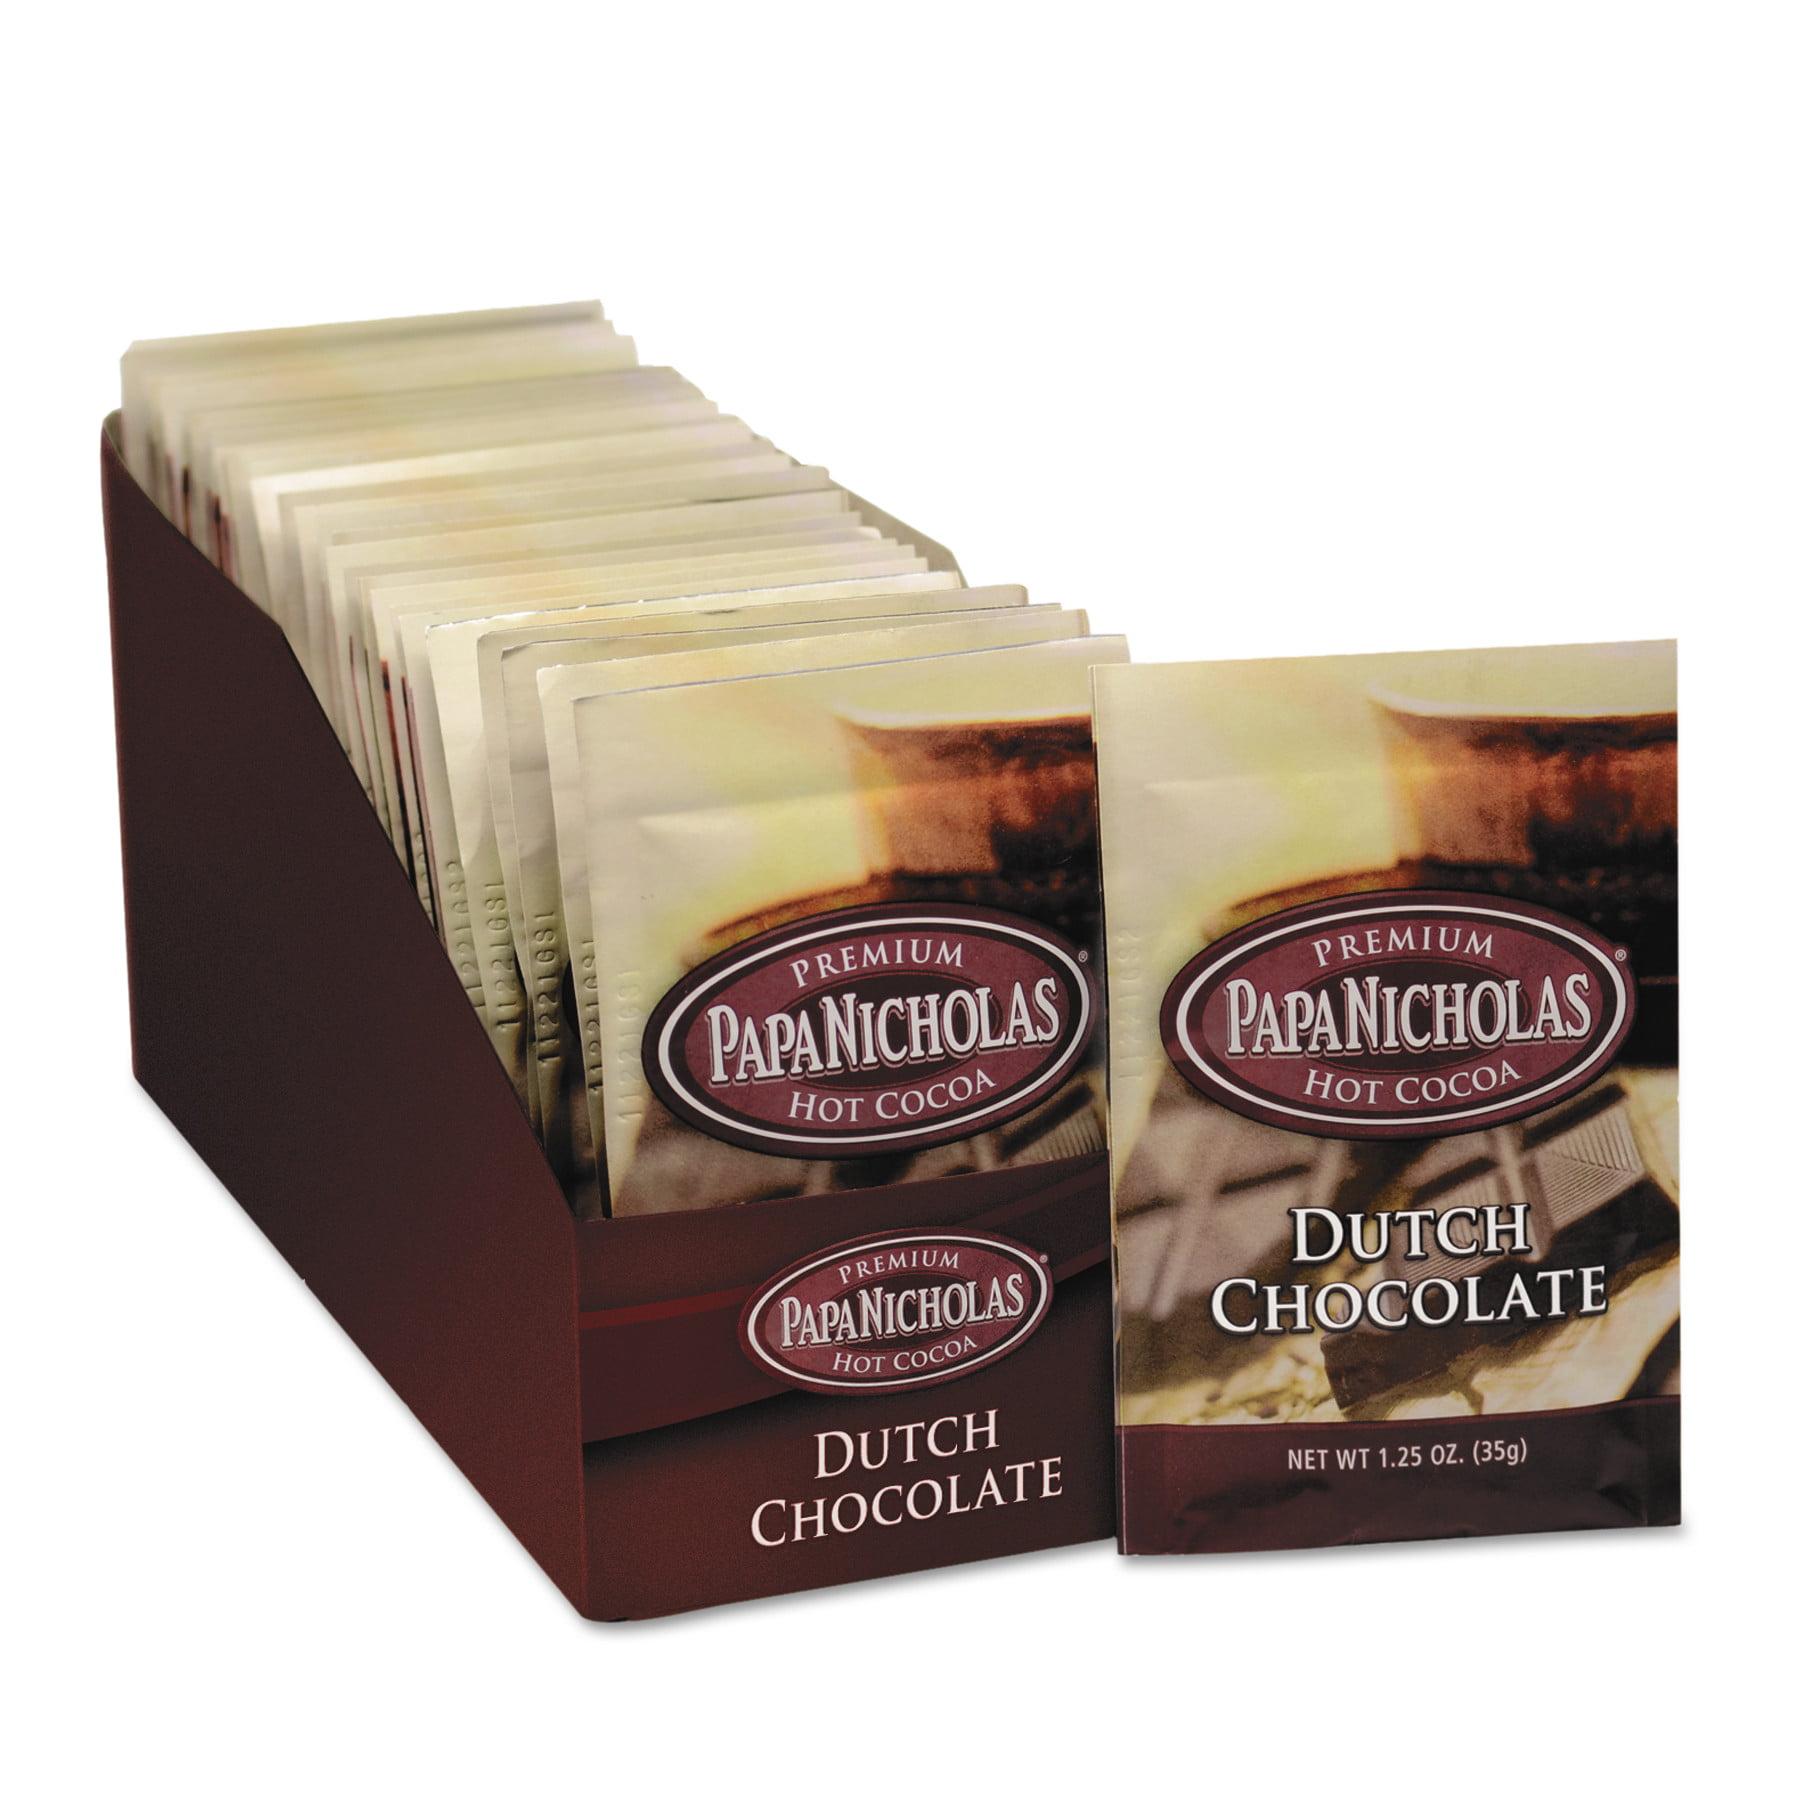 PapaNicholas Dutch Chocolate Premium Hot Cocoa Mix, 1.25 oz, 24 ...